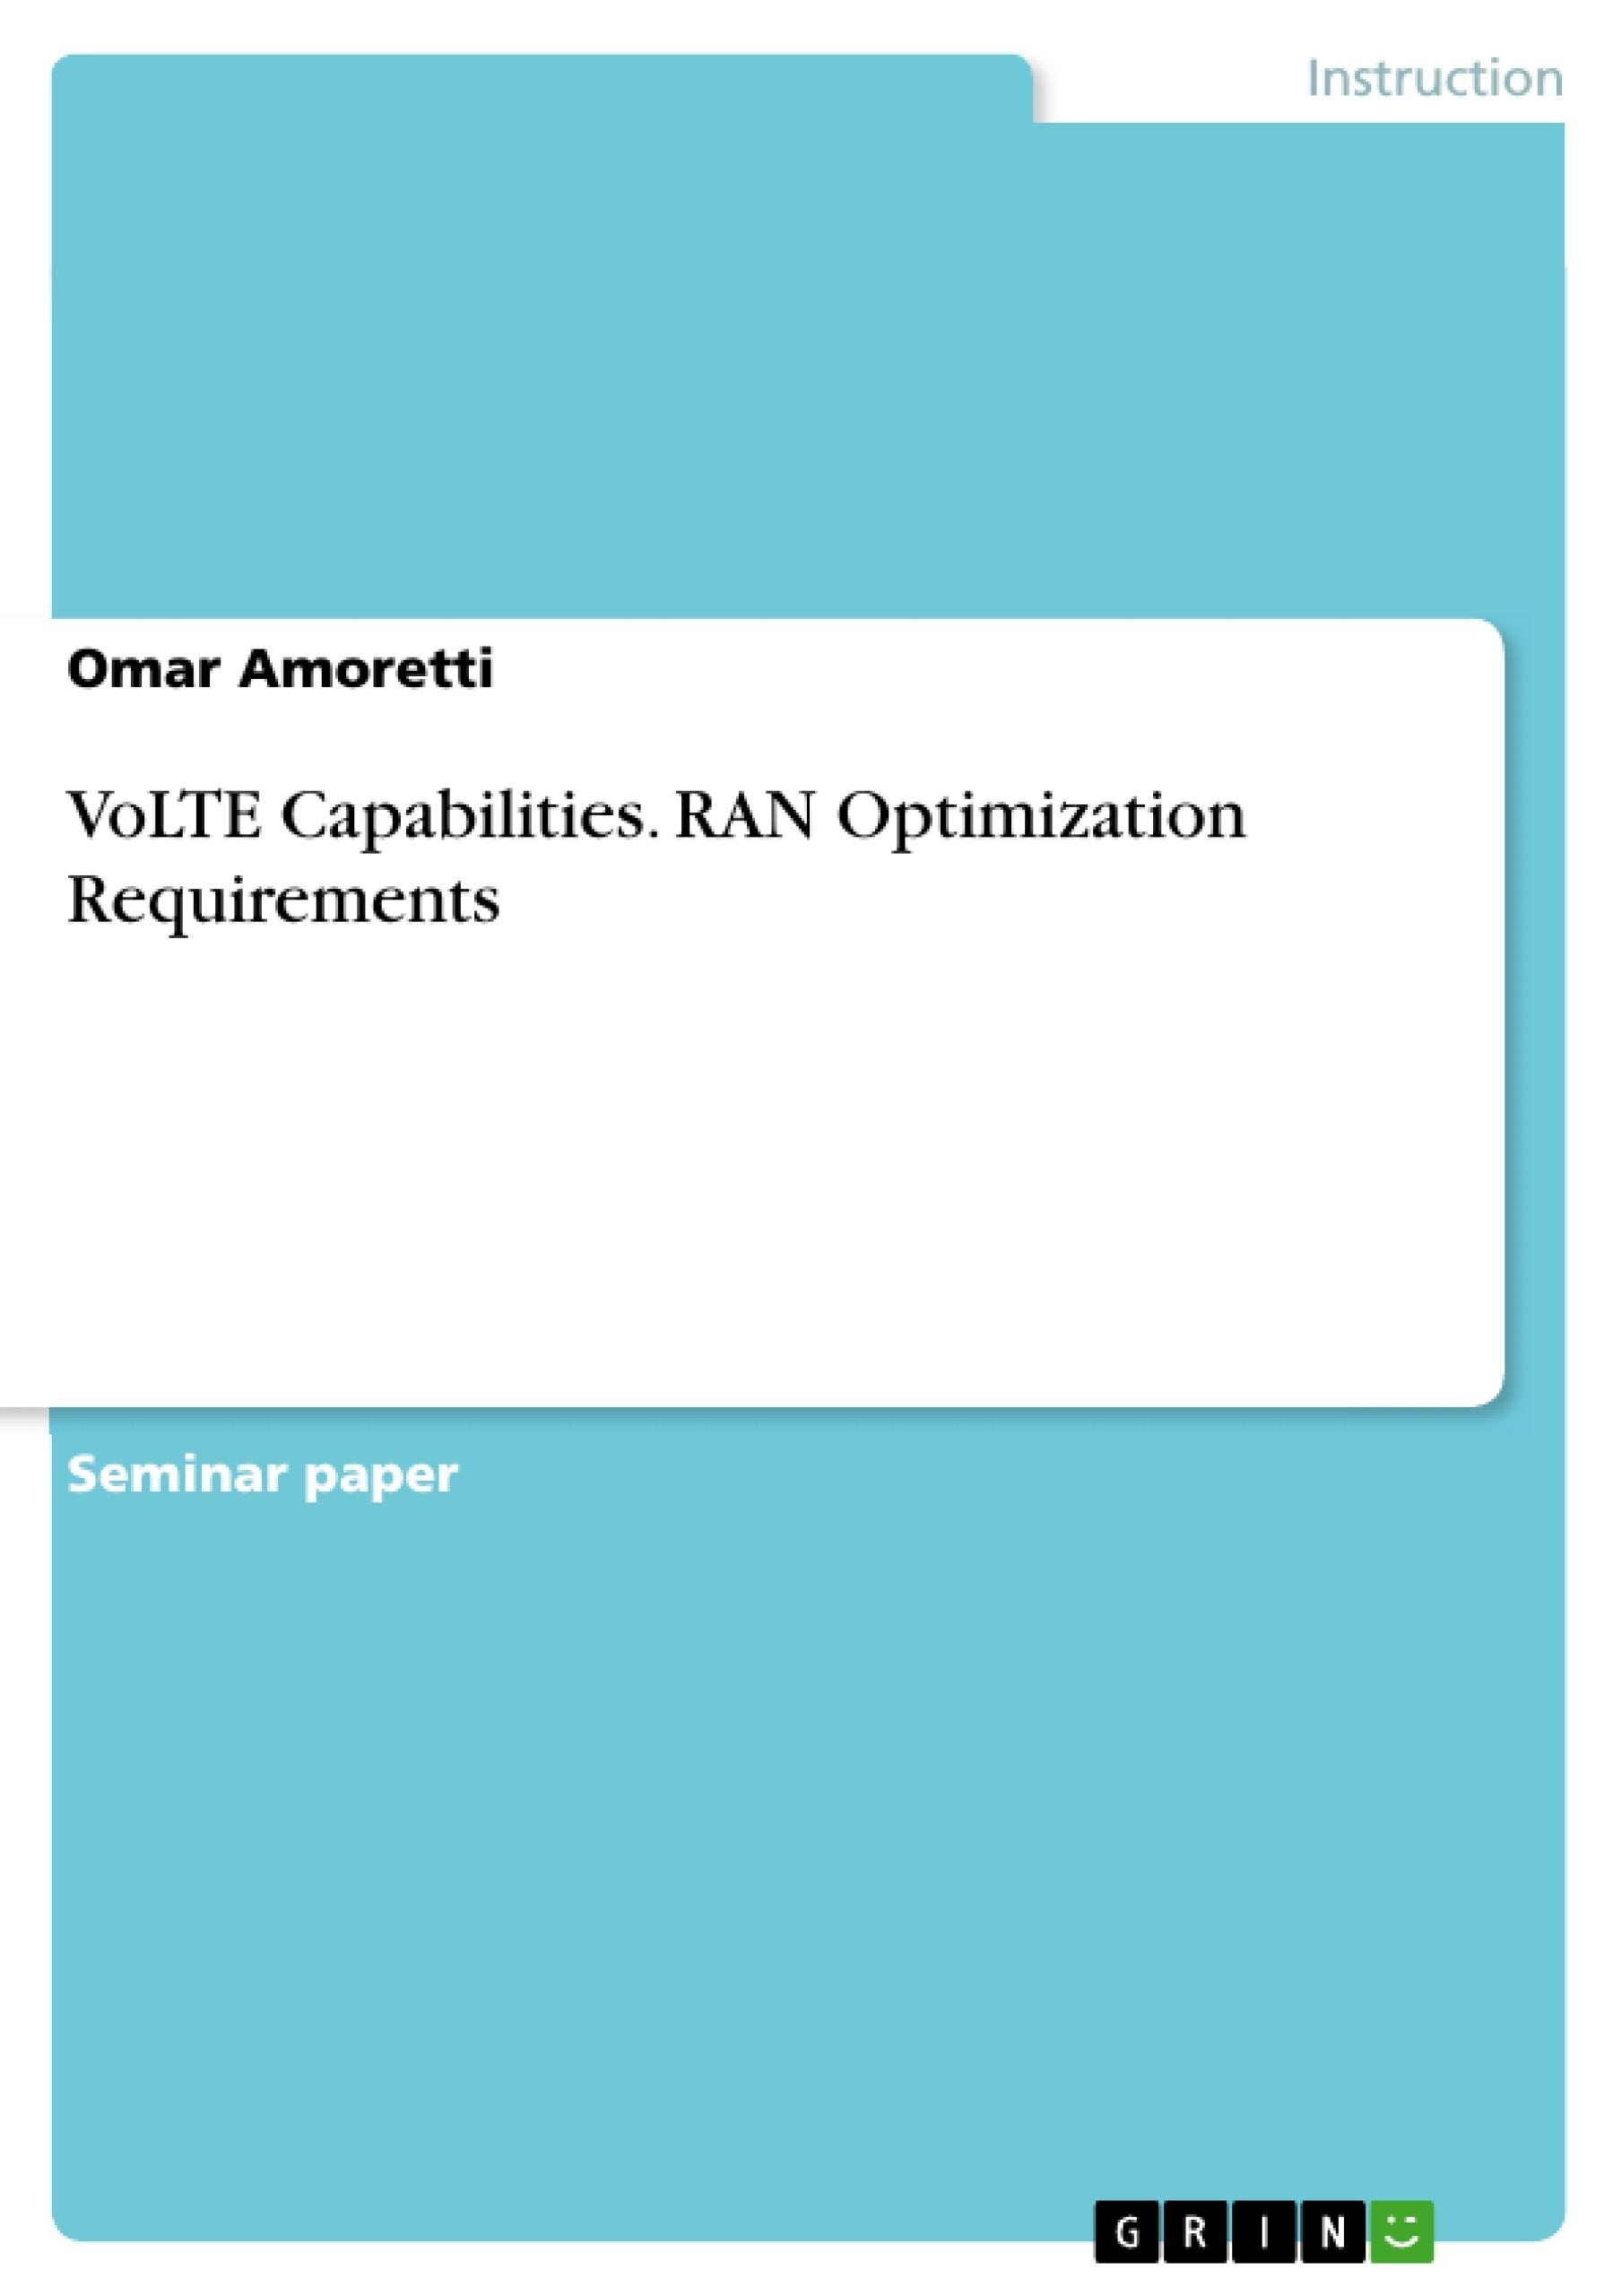 thesis capability กรณีศึกษา : การพัฒนาระบบมาตรฐาน cmm (capability maturity model.